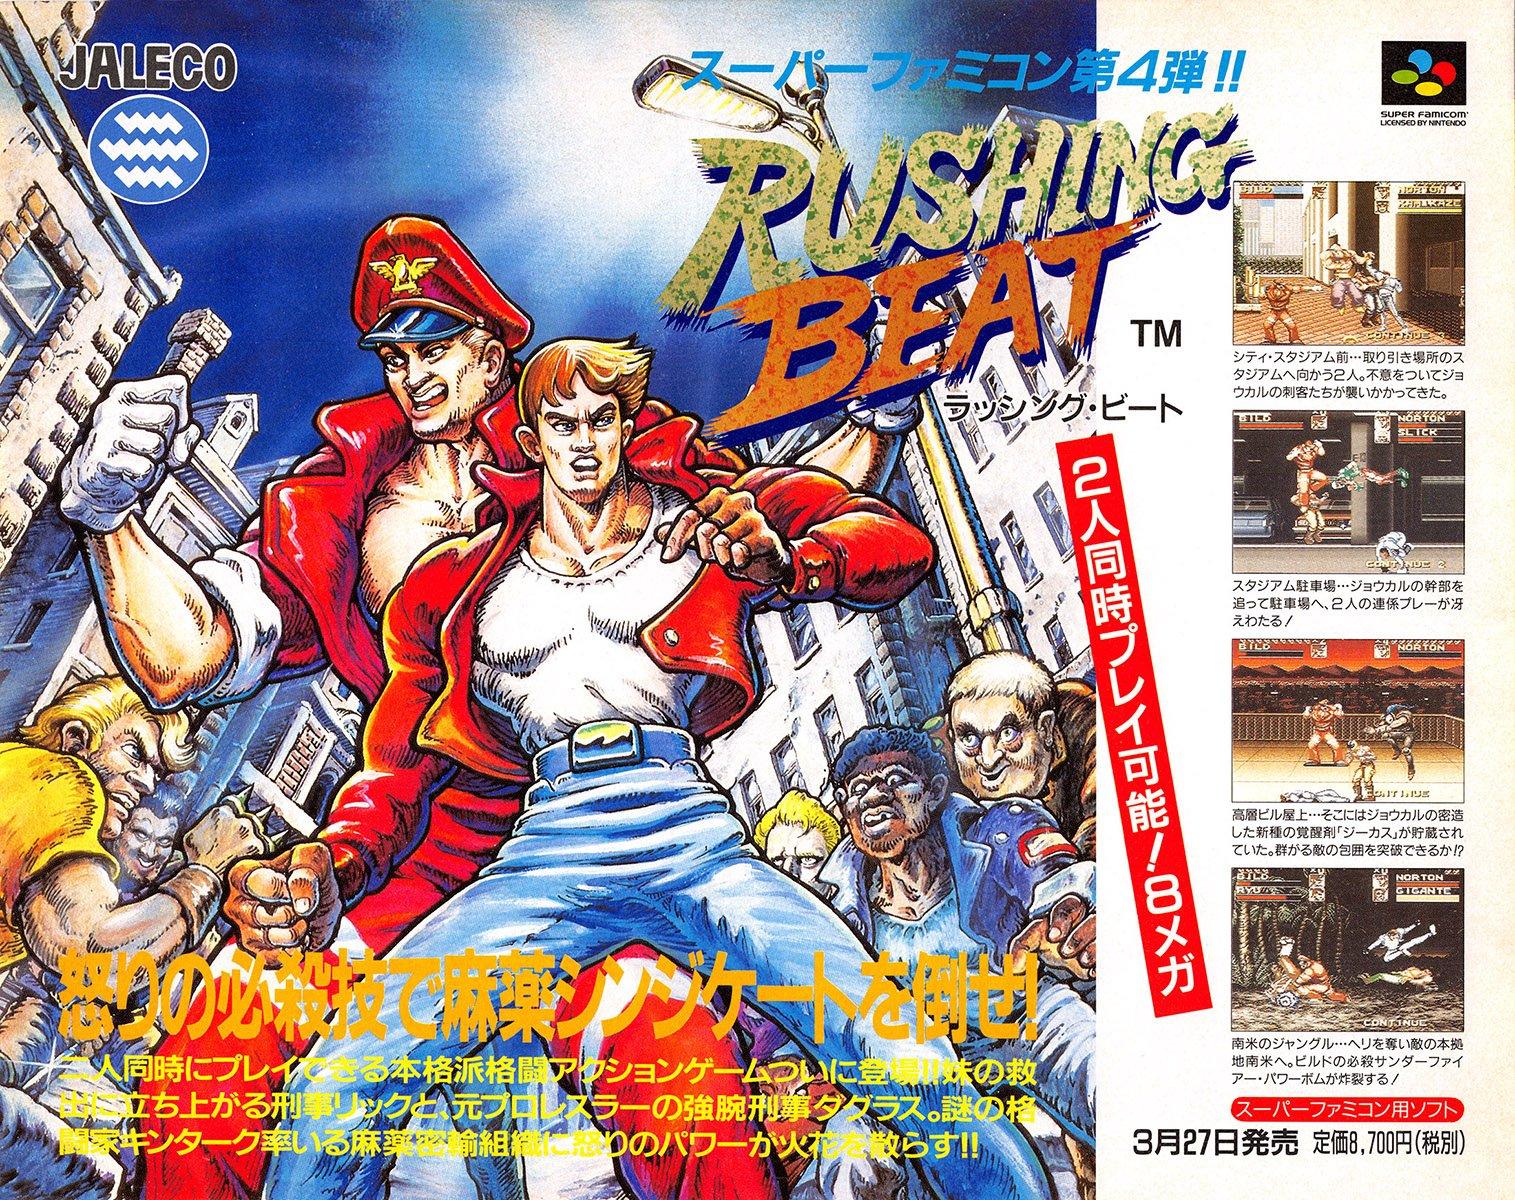 Rival Turf! (Rushing Beat) (Japan) (2)